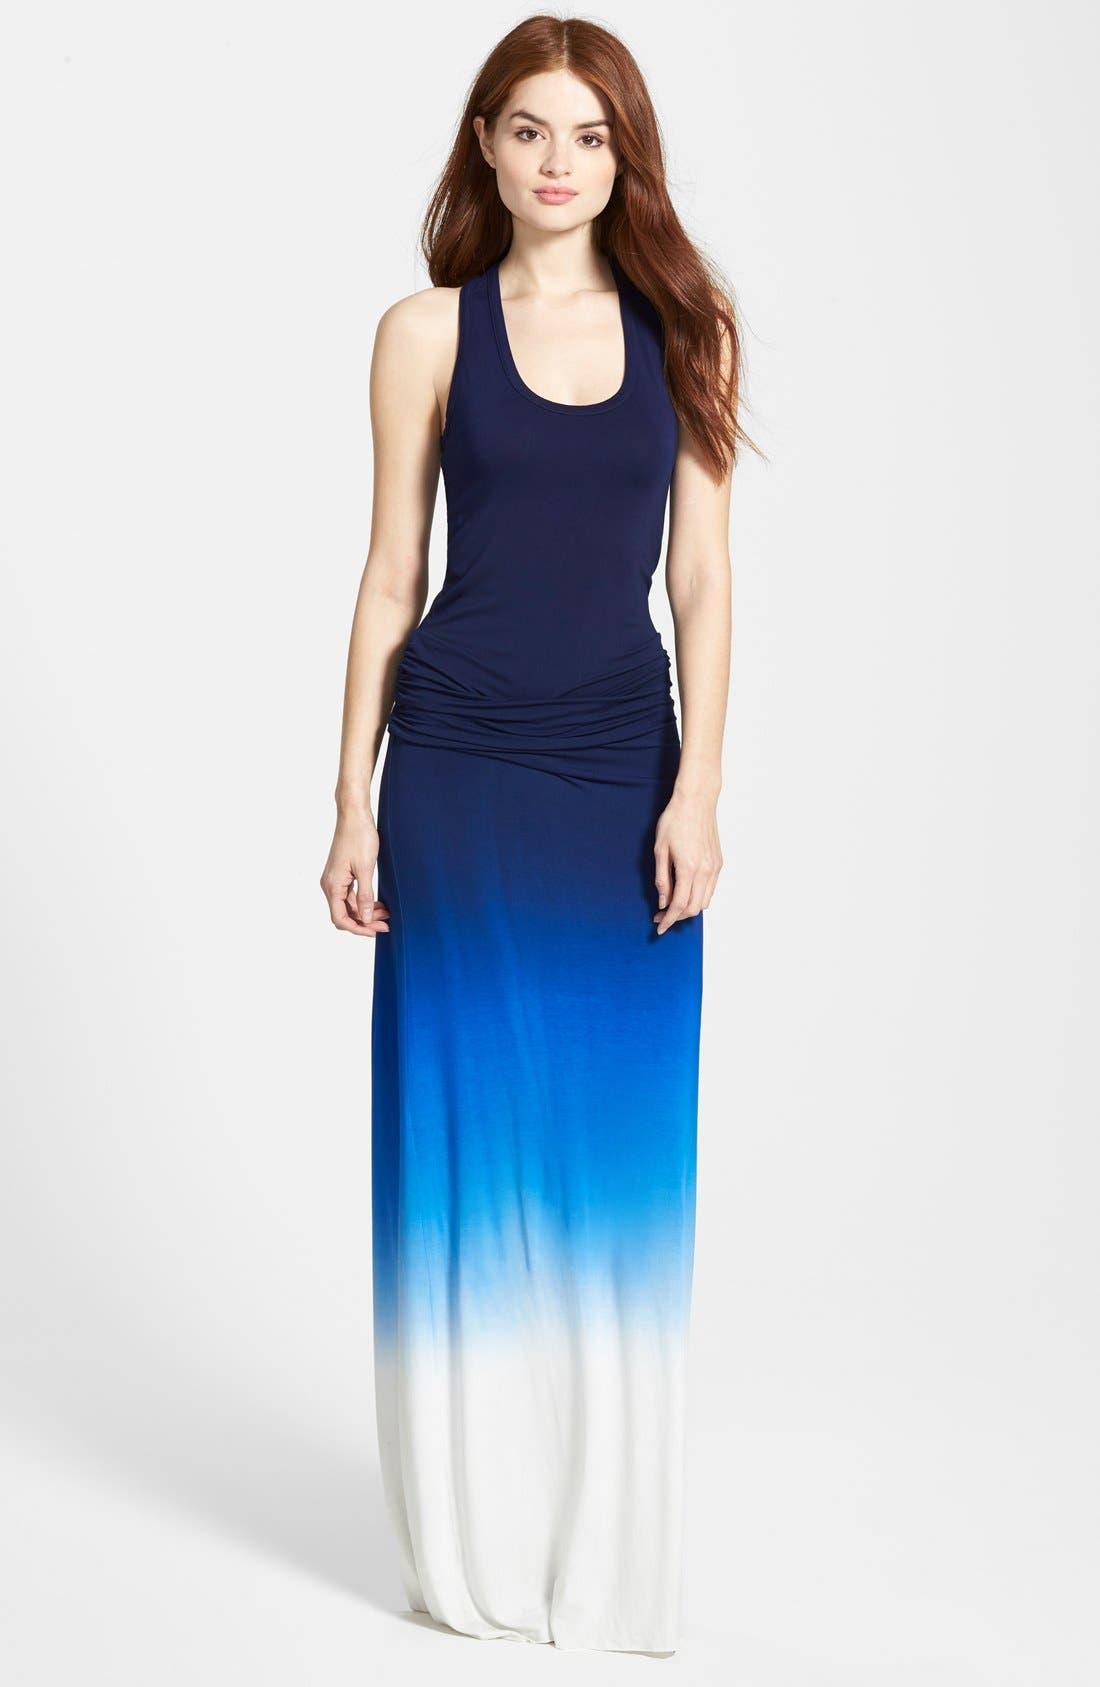 Alternate Image 1 Selected - Young, Fabulous & Broke 'Hamptons' Maxi Dress